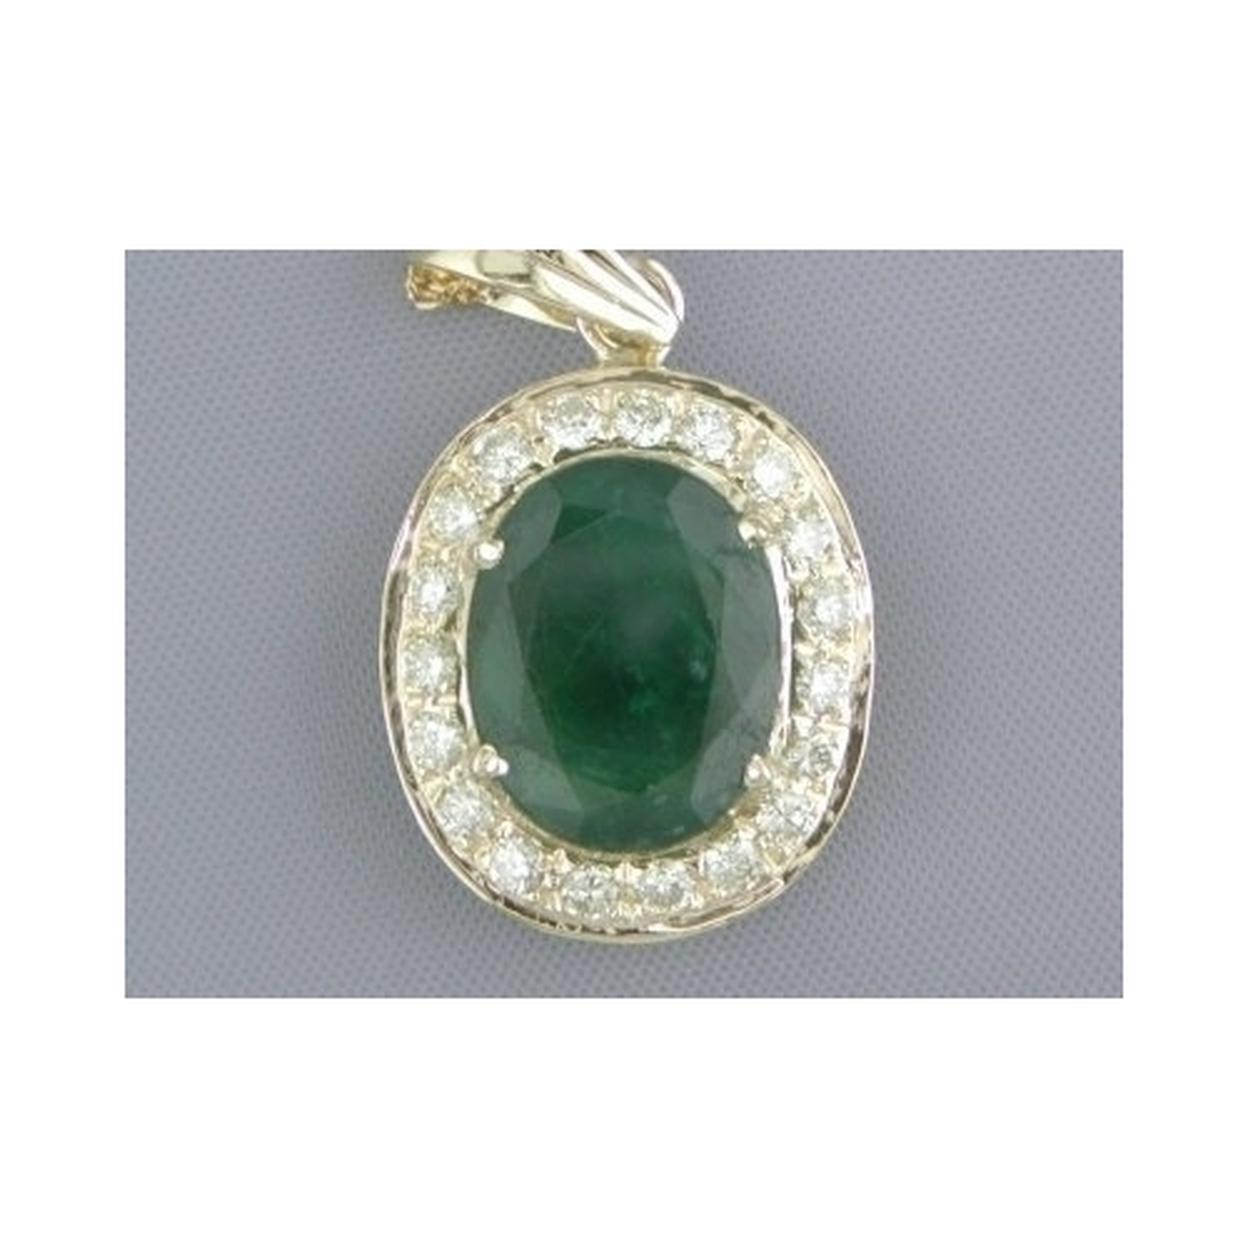 Fabulous 5.70cts Oval Emerald & H/vs Diamond Pendant Style P8230